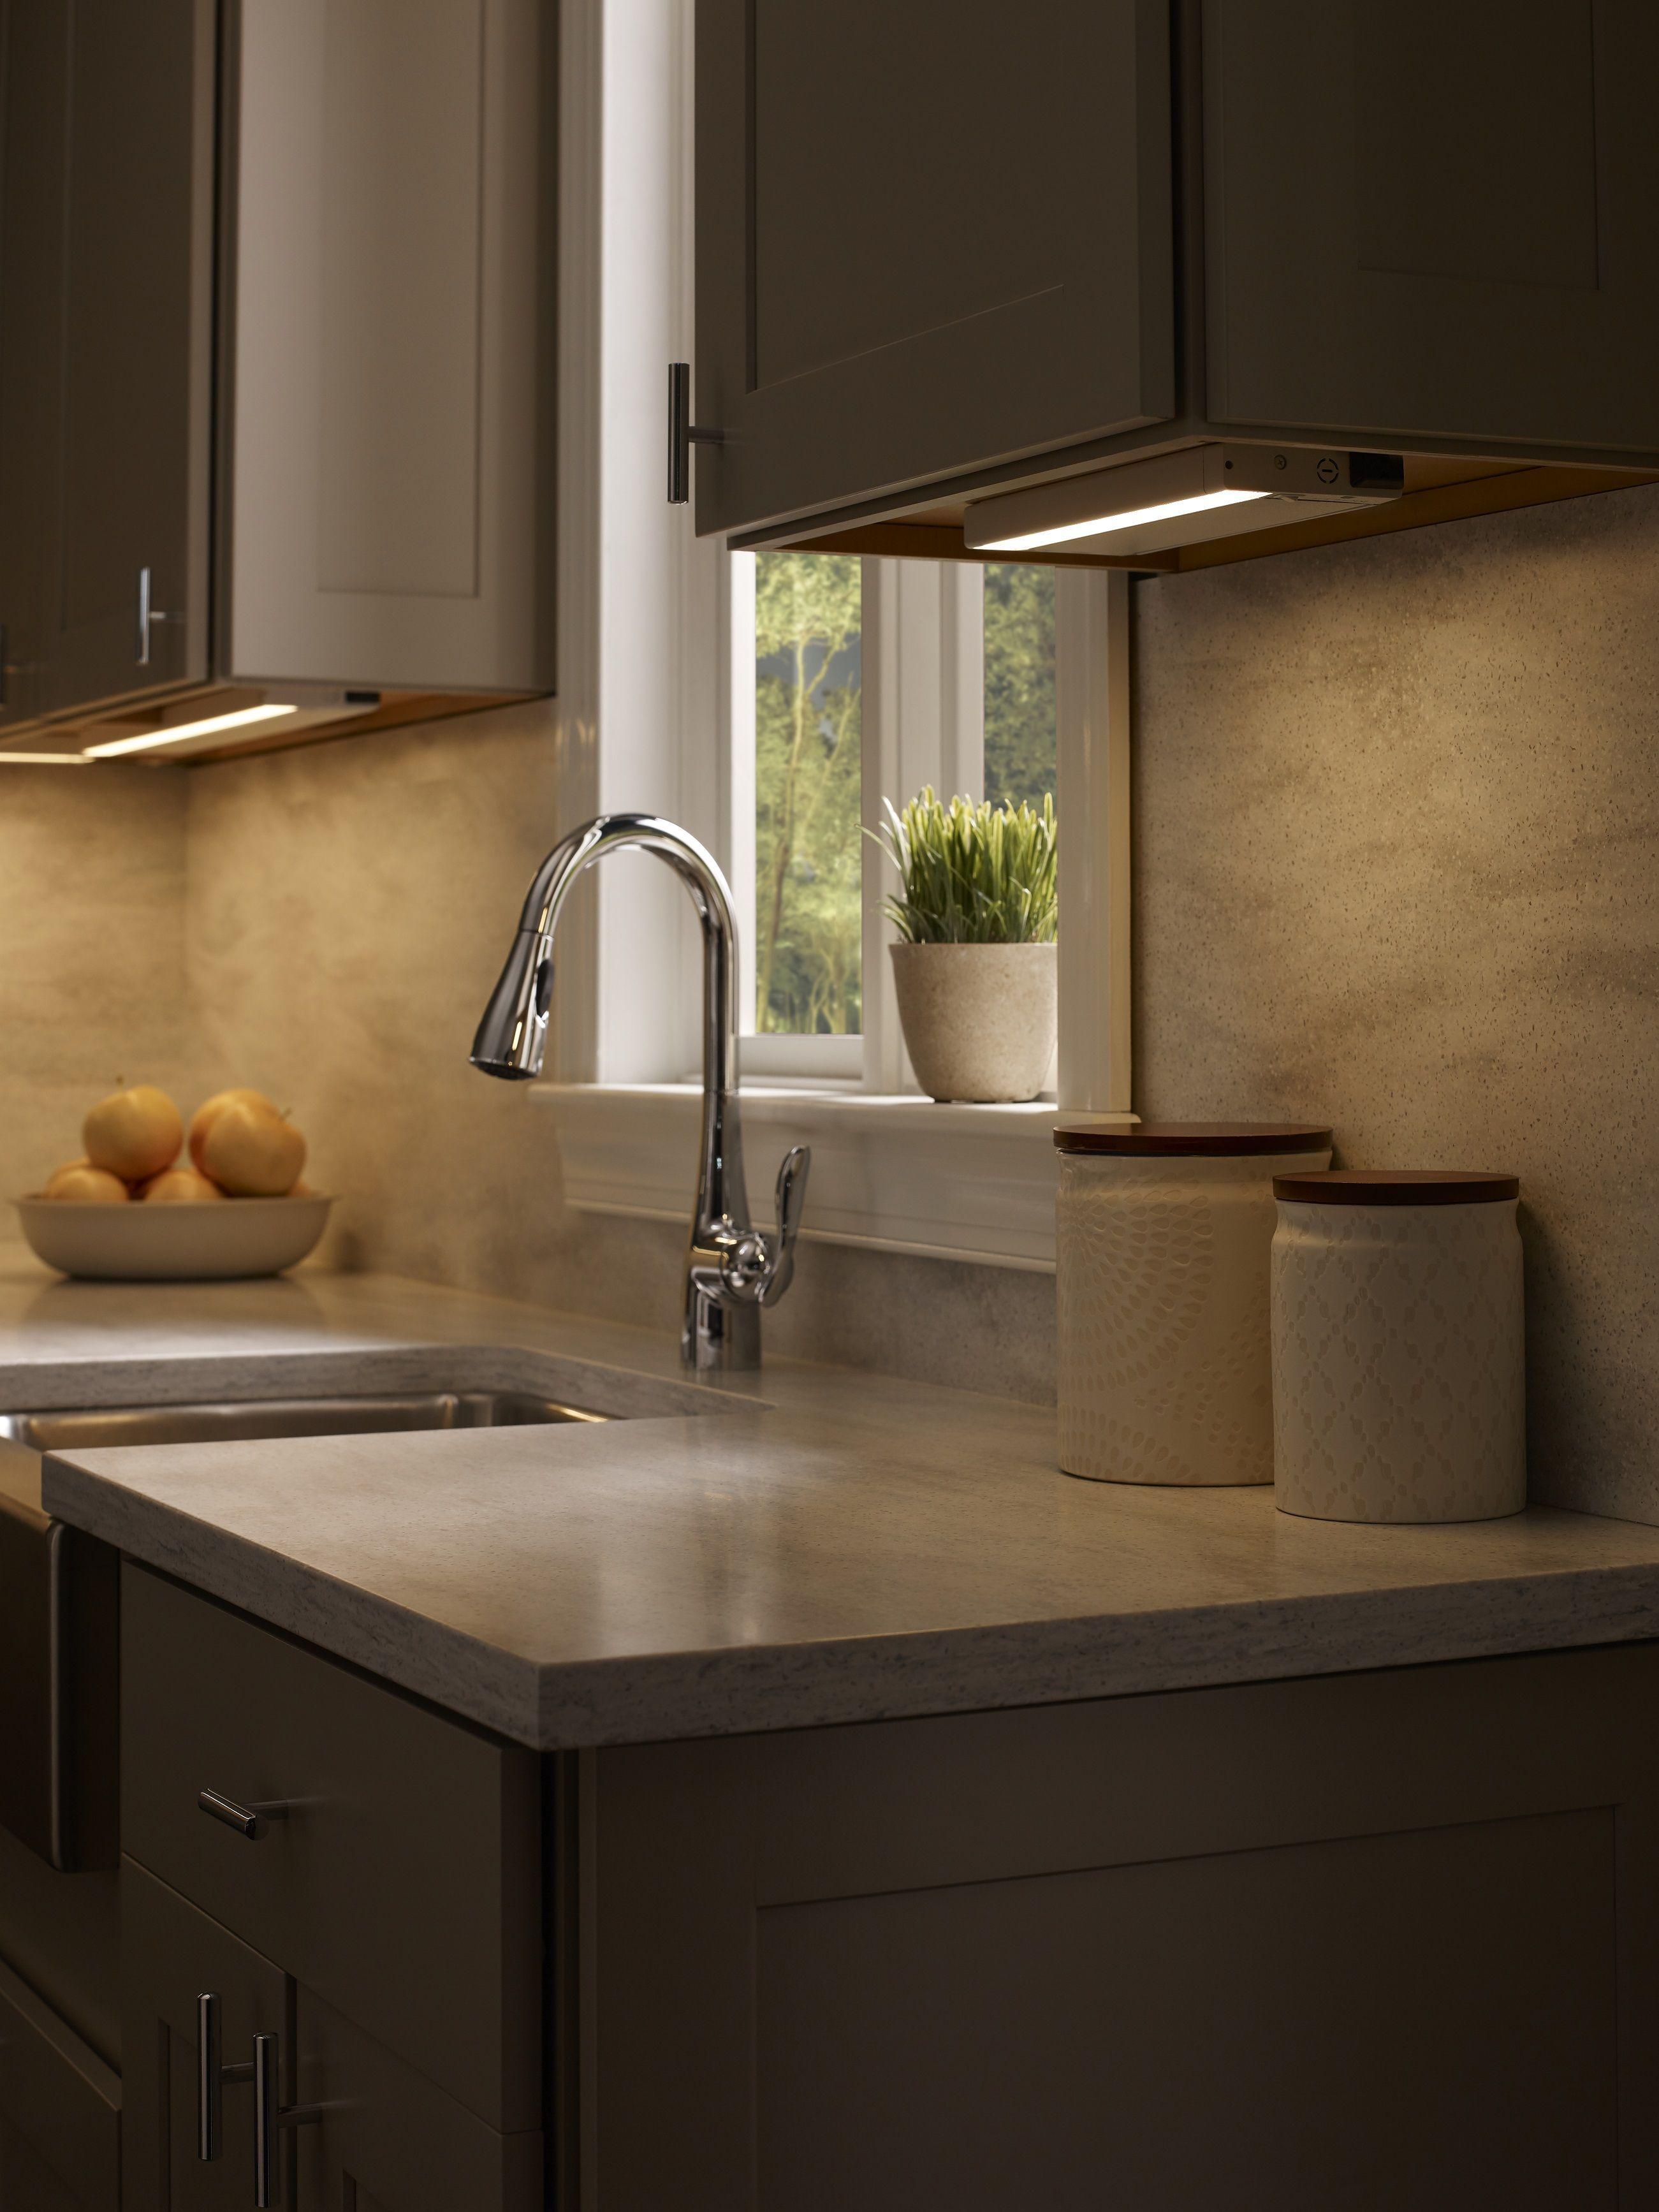 Kichler Dekker Lighting Trendy Kitchen Under Cabinet Lighting Cabinet Lighting